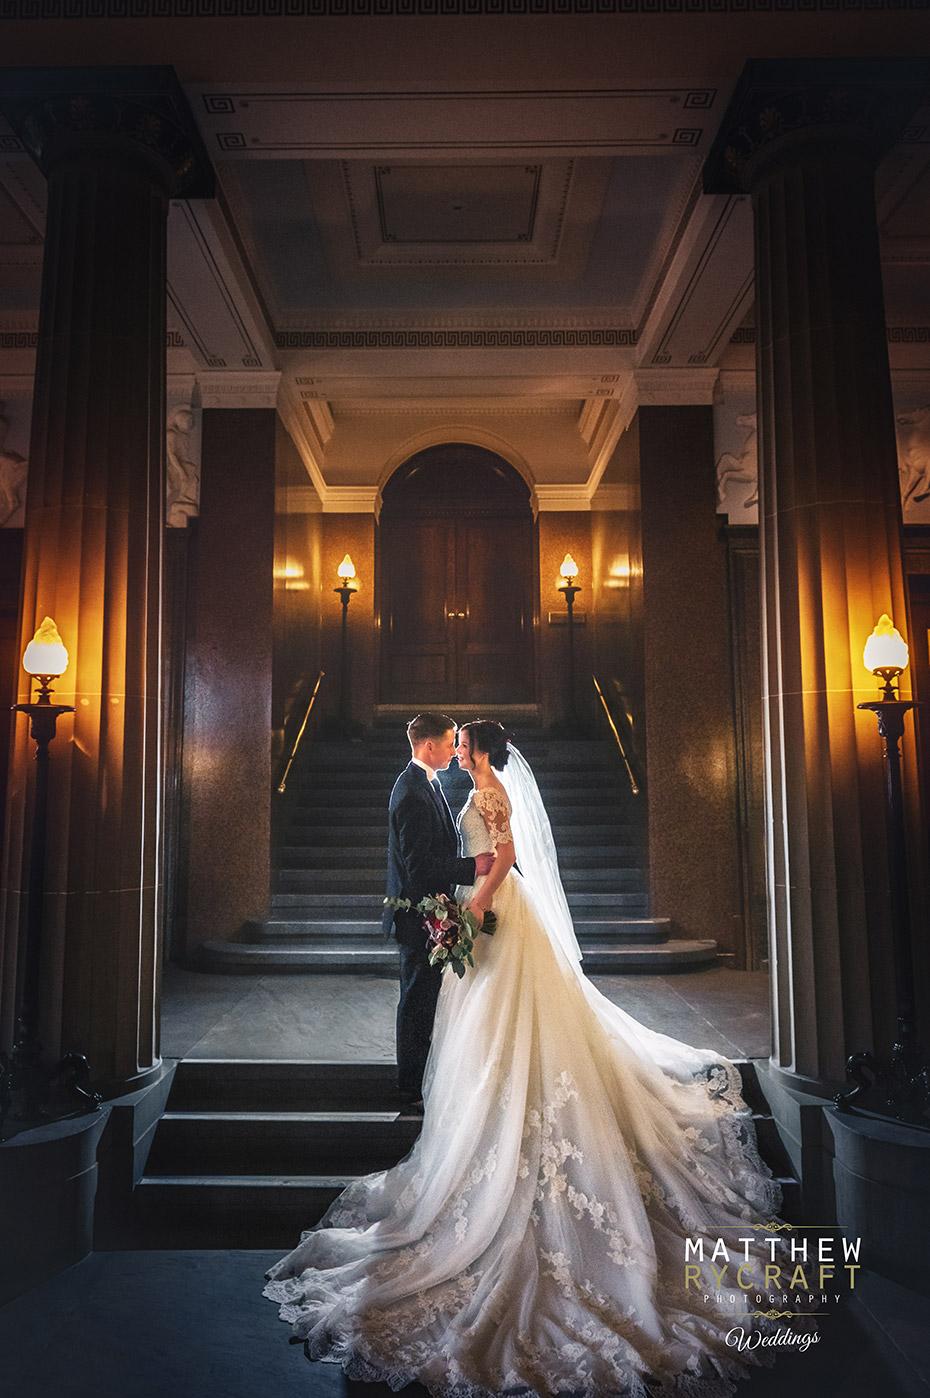 St-Georges-Hall-Wedding-Venue-002